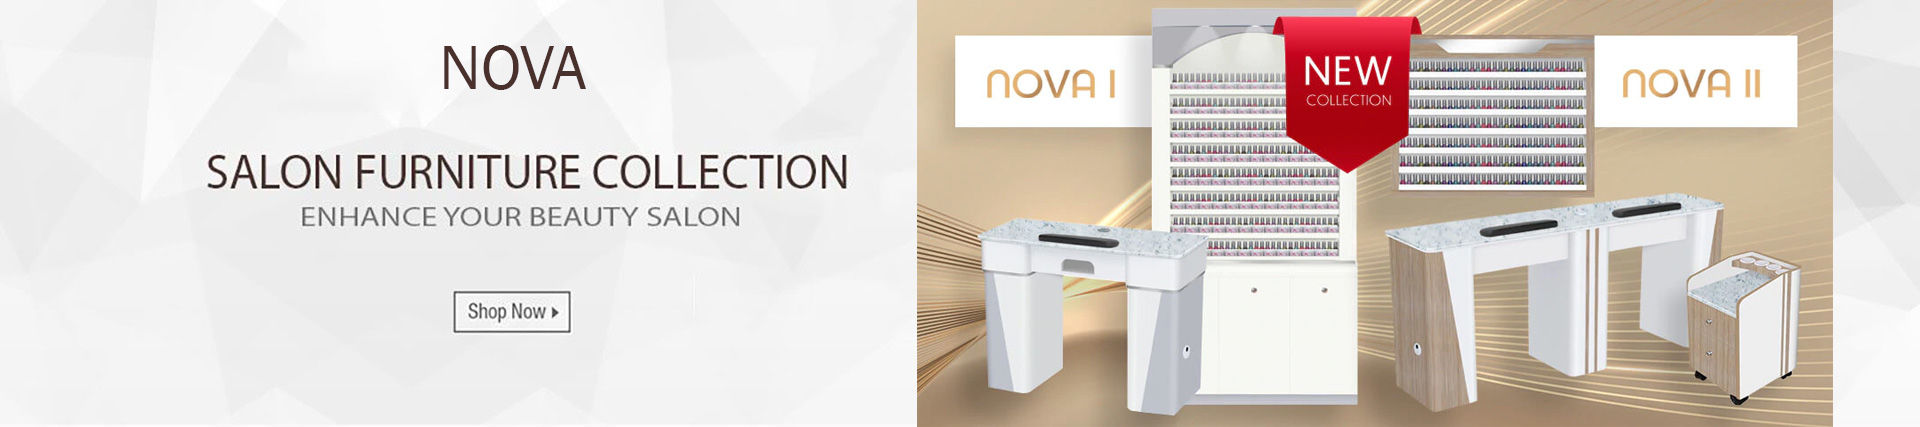 Nova nail salon furniture collection